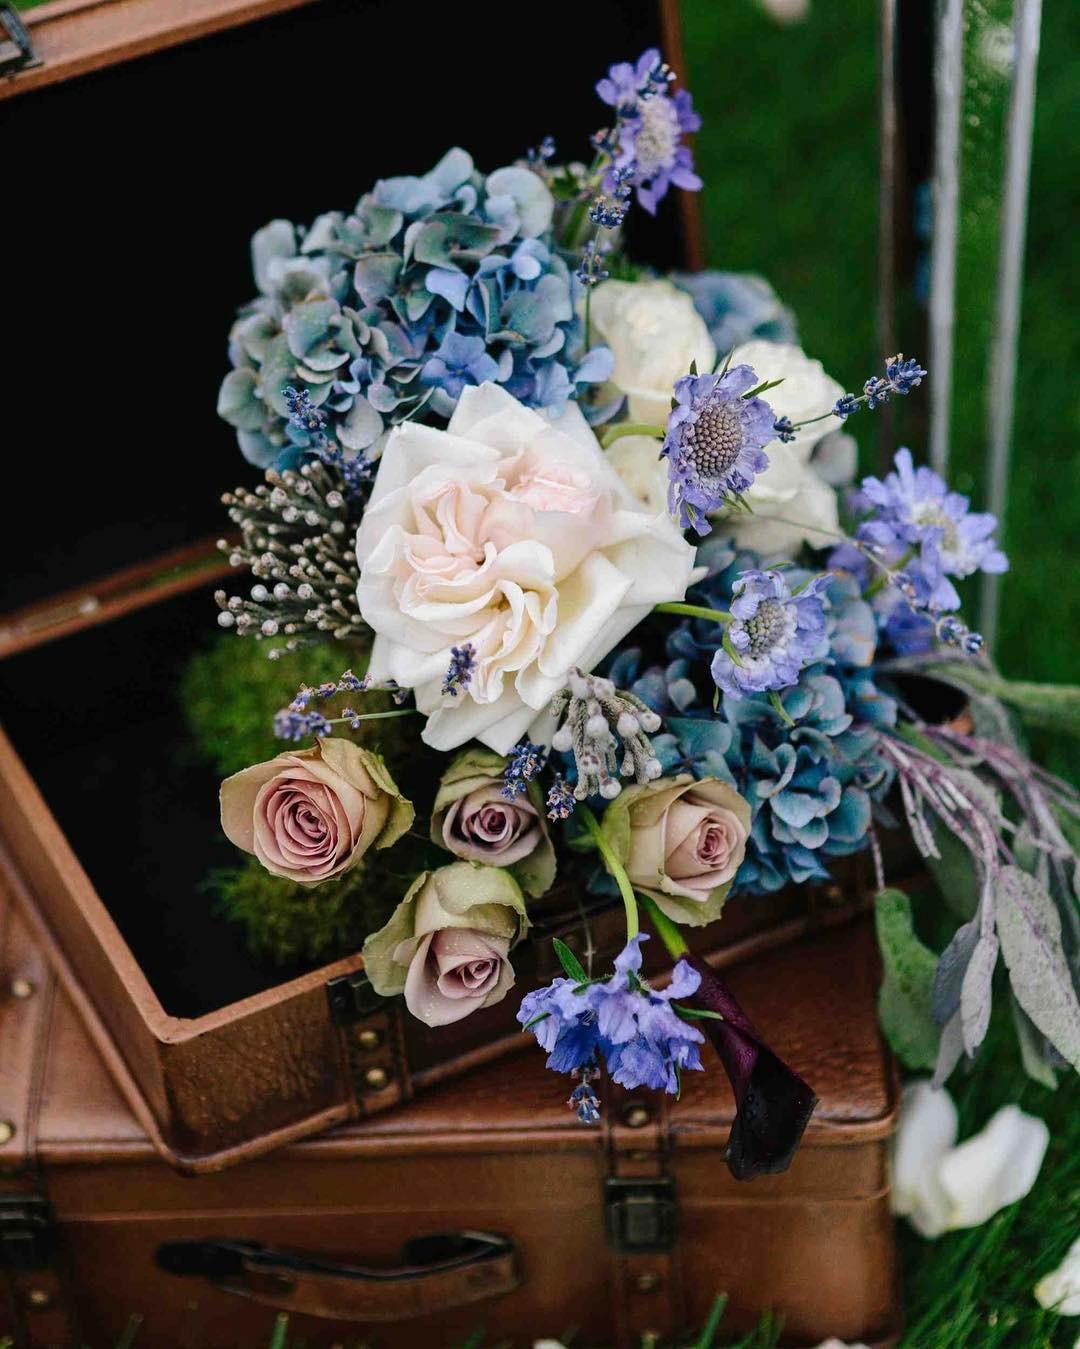 {vintage} photo | @rodeoandcophoto  #vintageluggage #vintageflowers #vintagestyle #whiteohara #amnesiarose #antiquehydrangea #scabiosa #lavender #sage #purpleflowers #blushpink #blueflowers #lotusfloraldesigns #weddingflorist #getcreative #flowerart